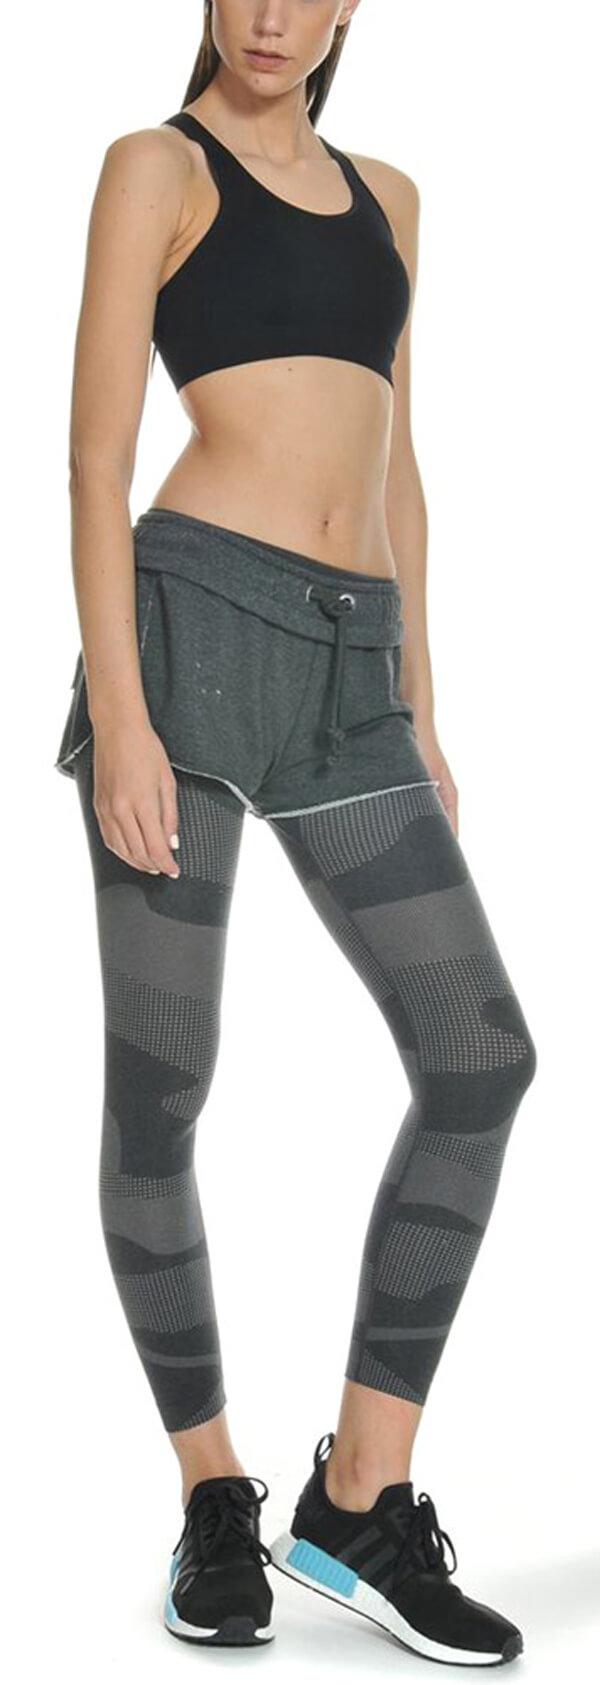 14ffcb1ccbb4 Κολαν Bodytalk Seamless Leggings Γκρι Array (l) - Sportswear-γυναικα ...